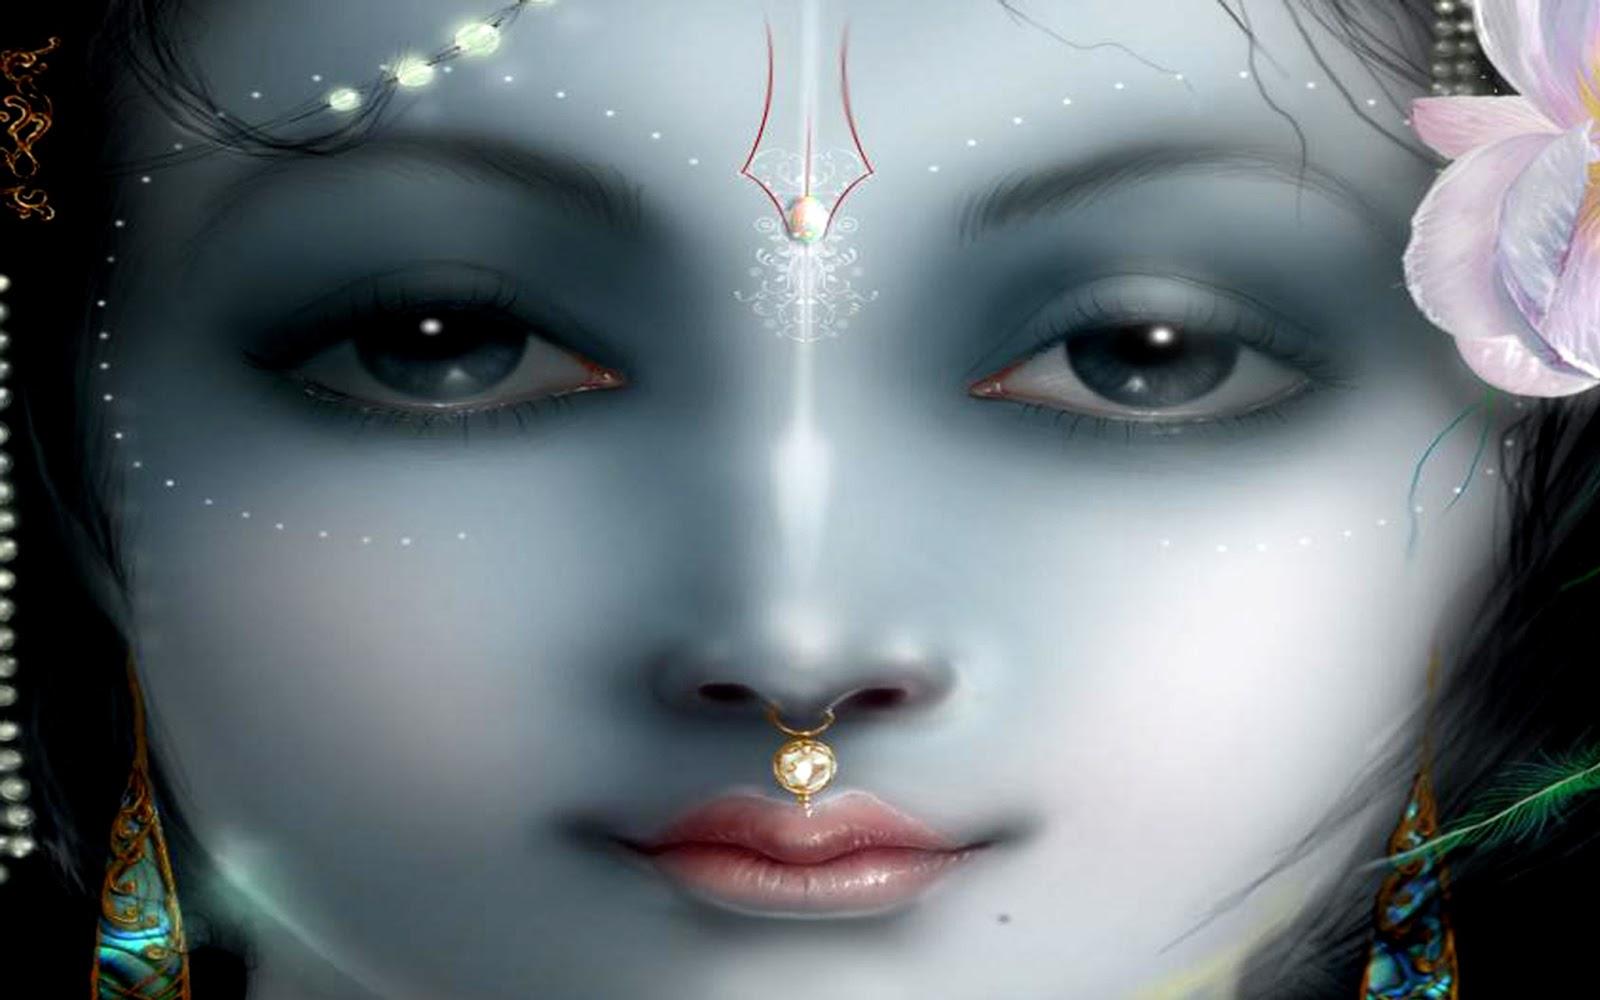 Play of consciousness swami muktananda